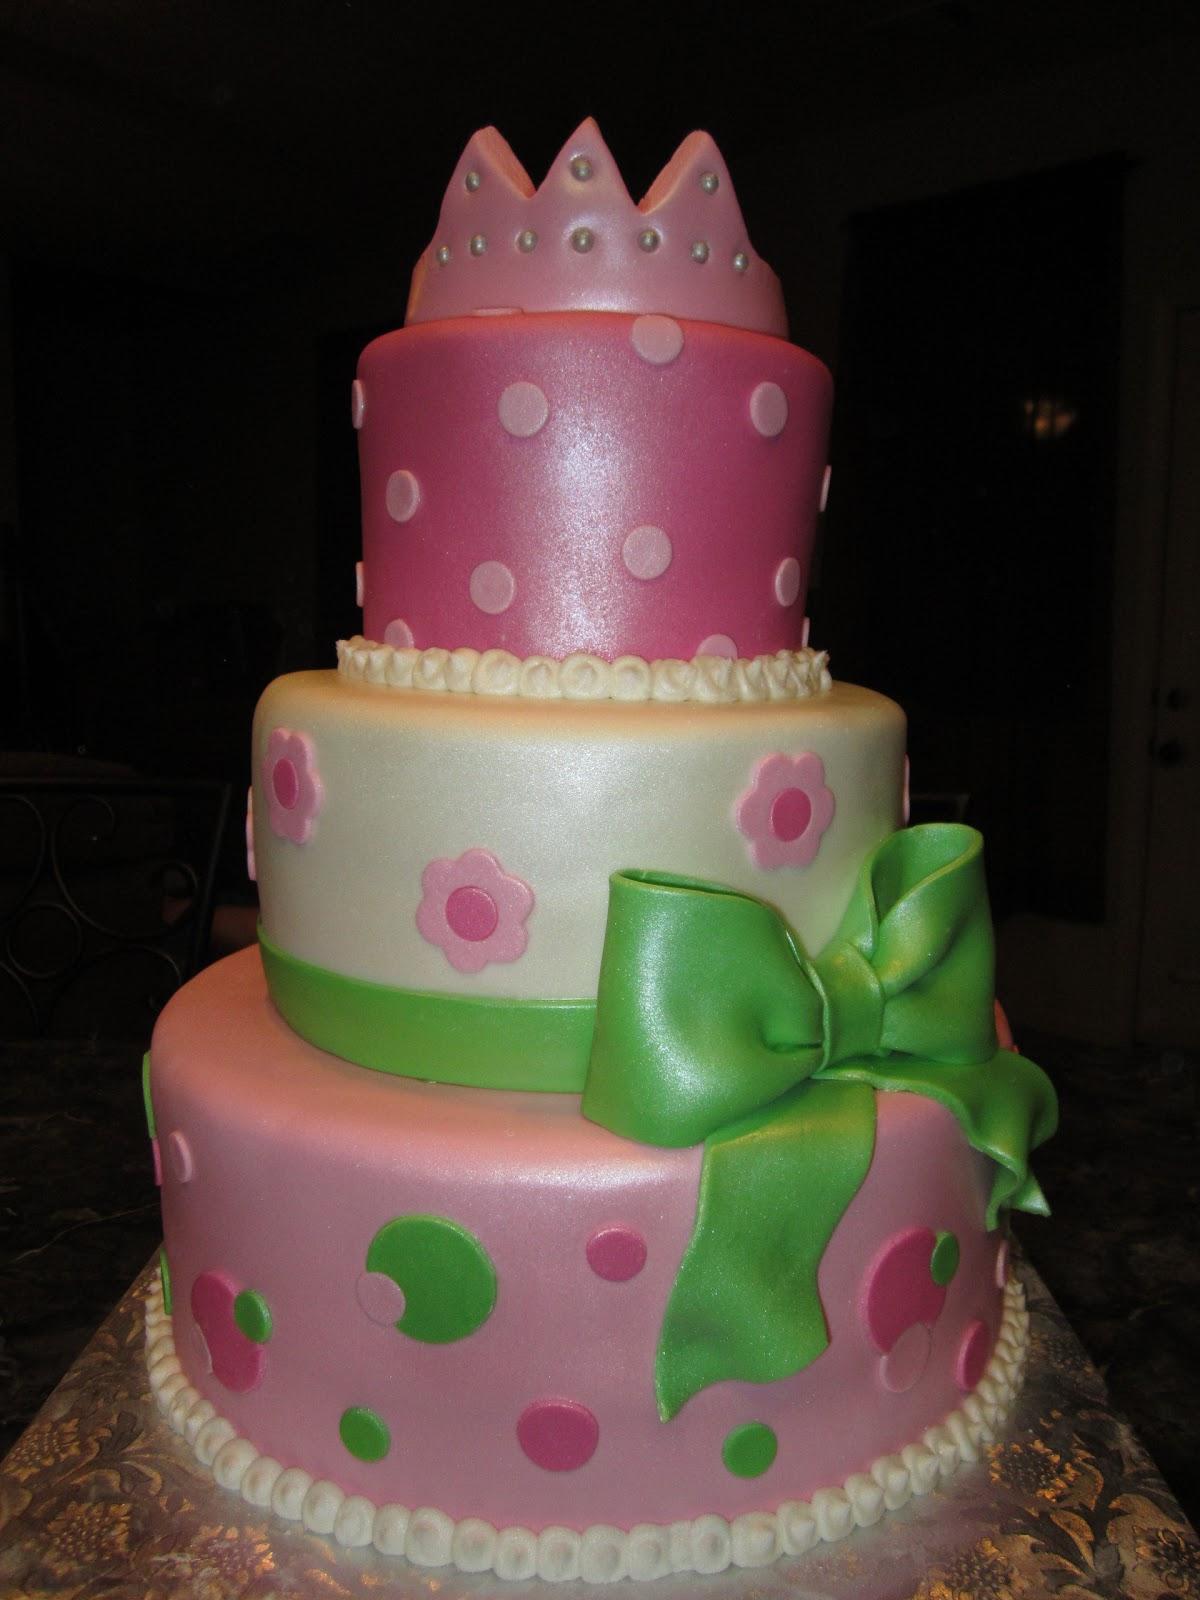 New Baby Cake Images : MyMoniCakes: New Little Princess Baby Shower Cake